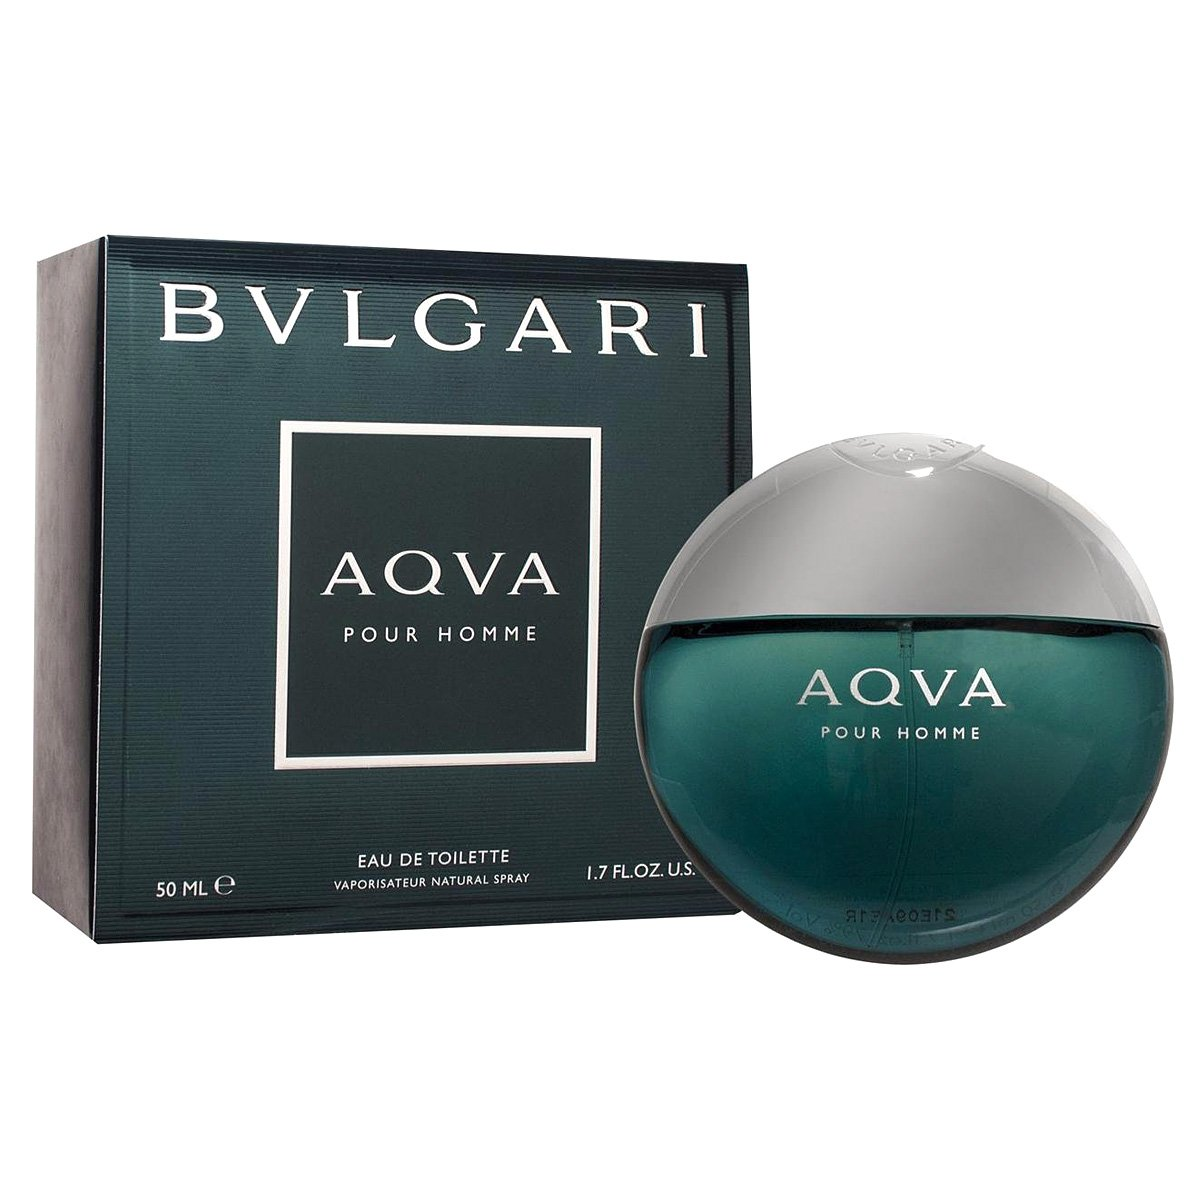 Туалетная вода Bvlgari Aqua Pour Homme для мужчин 100 мл. (тестер)